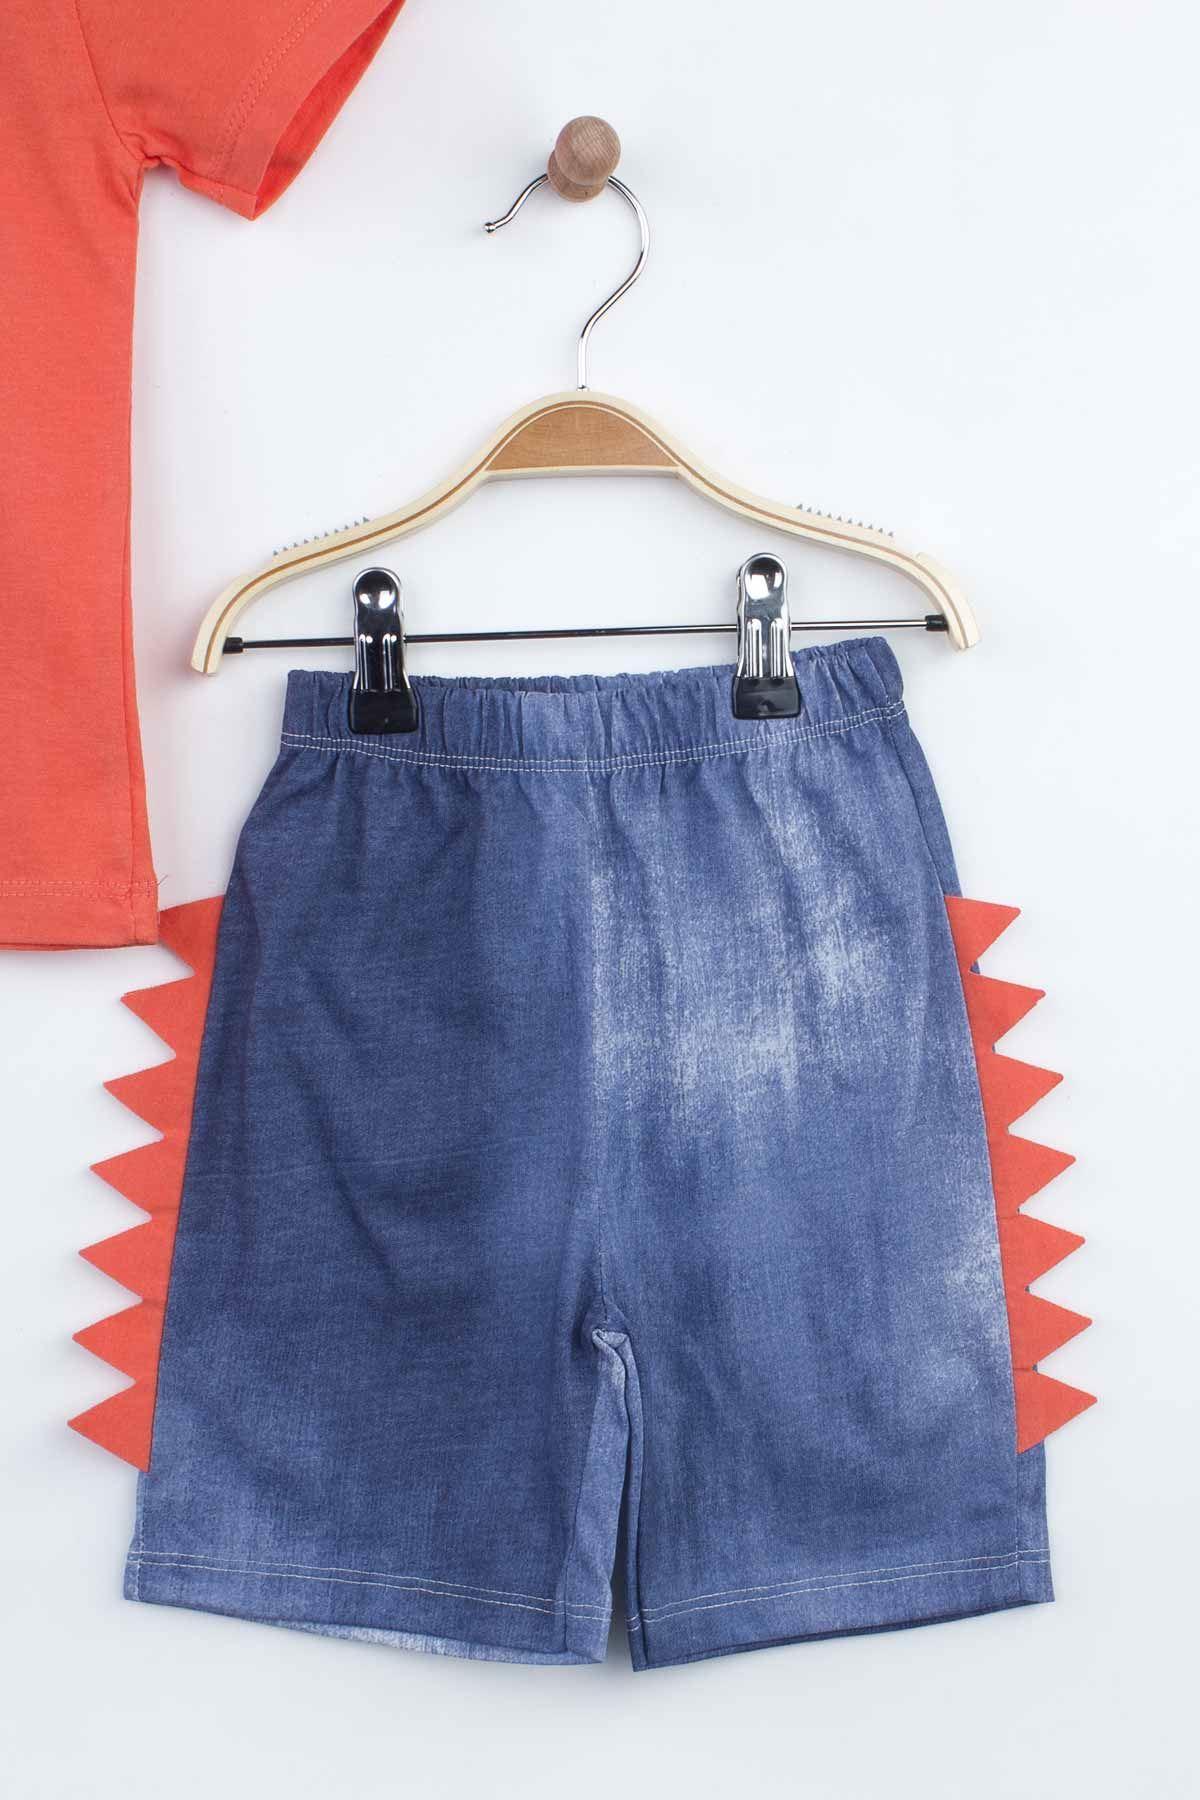 Orange Boy Children Suit Shorts Capri T-shirt Set Summer 2021 Fashion Kids Boys Outfit Cotton Casual Vacation Use clothing Model